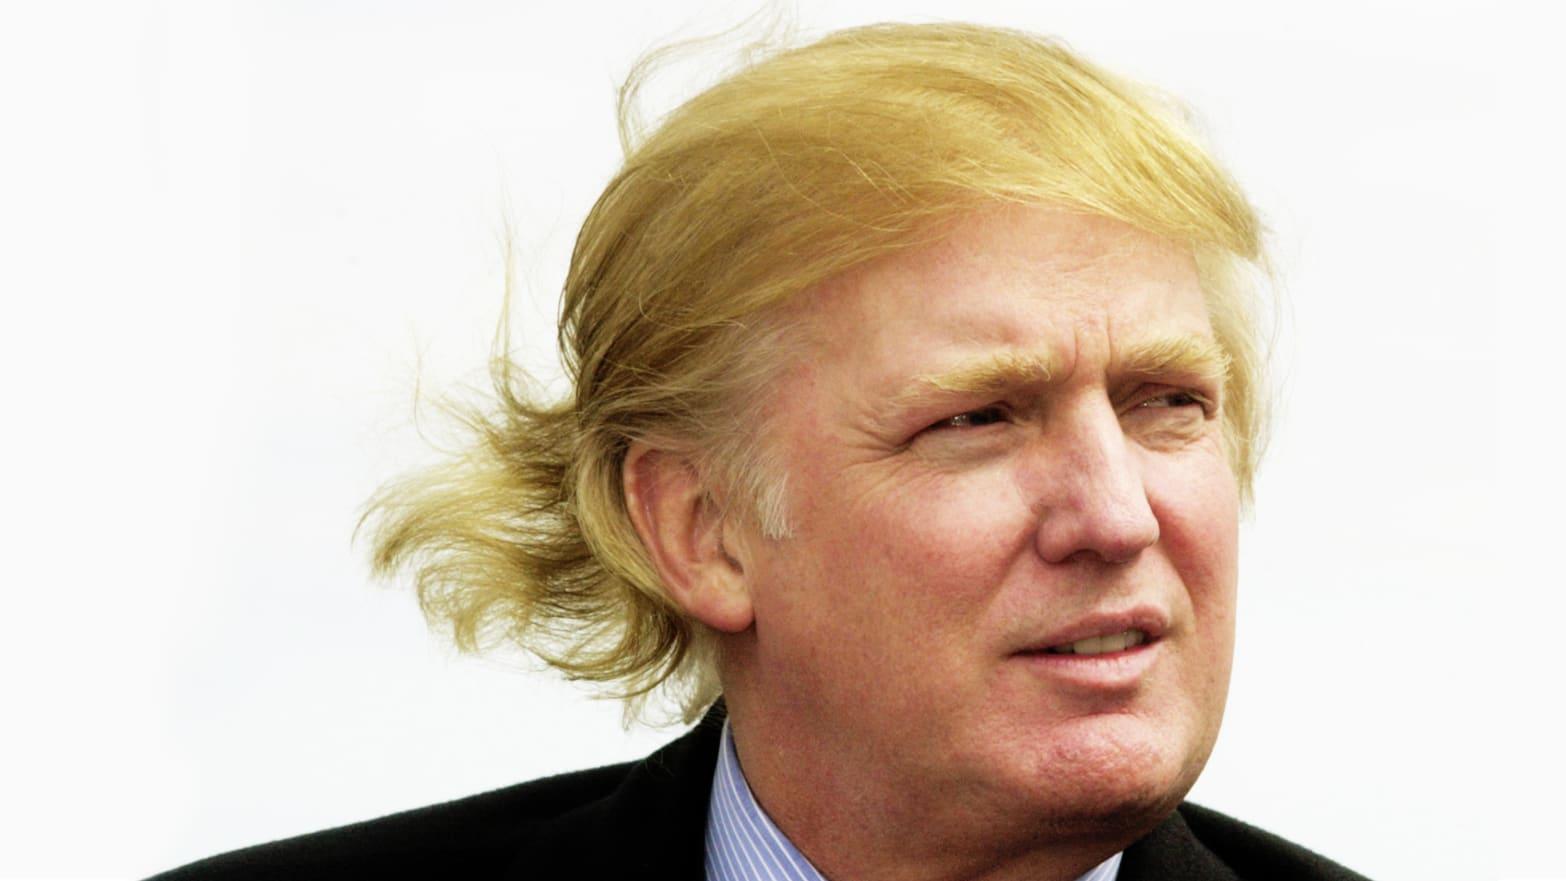 Trump's Tax Leak Hints at Potential Fraud Investigations